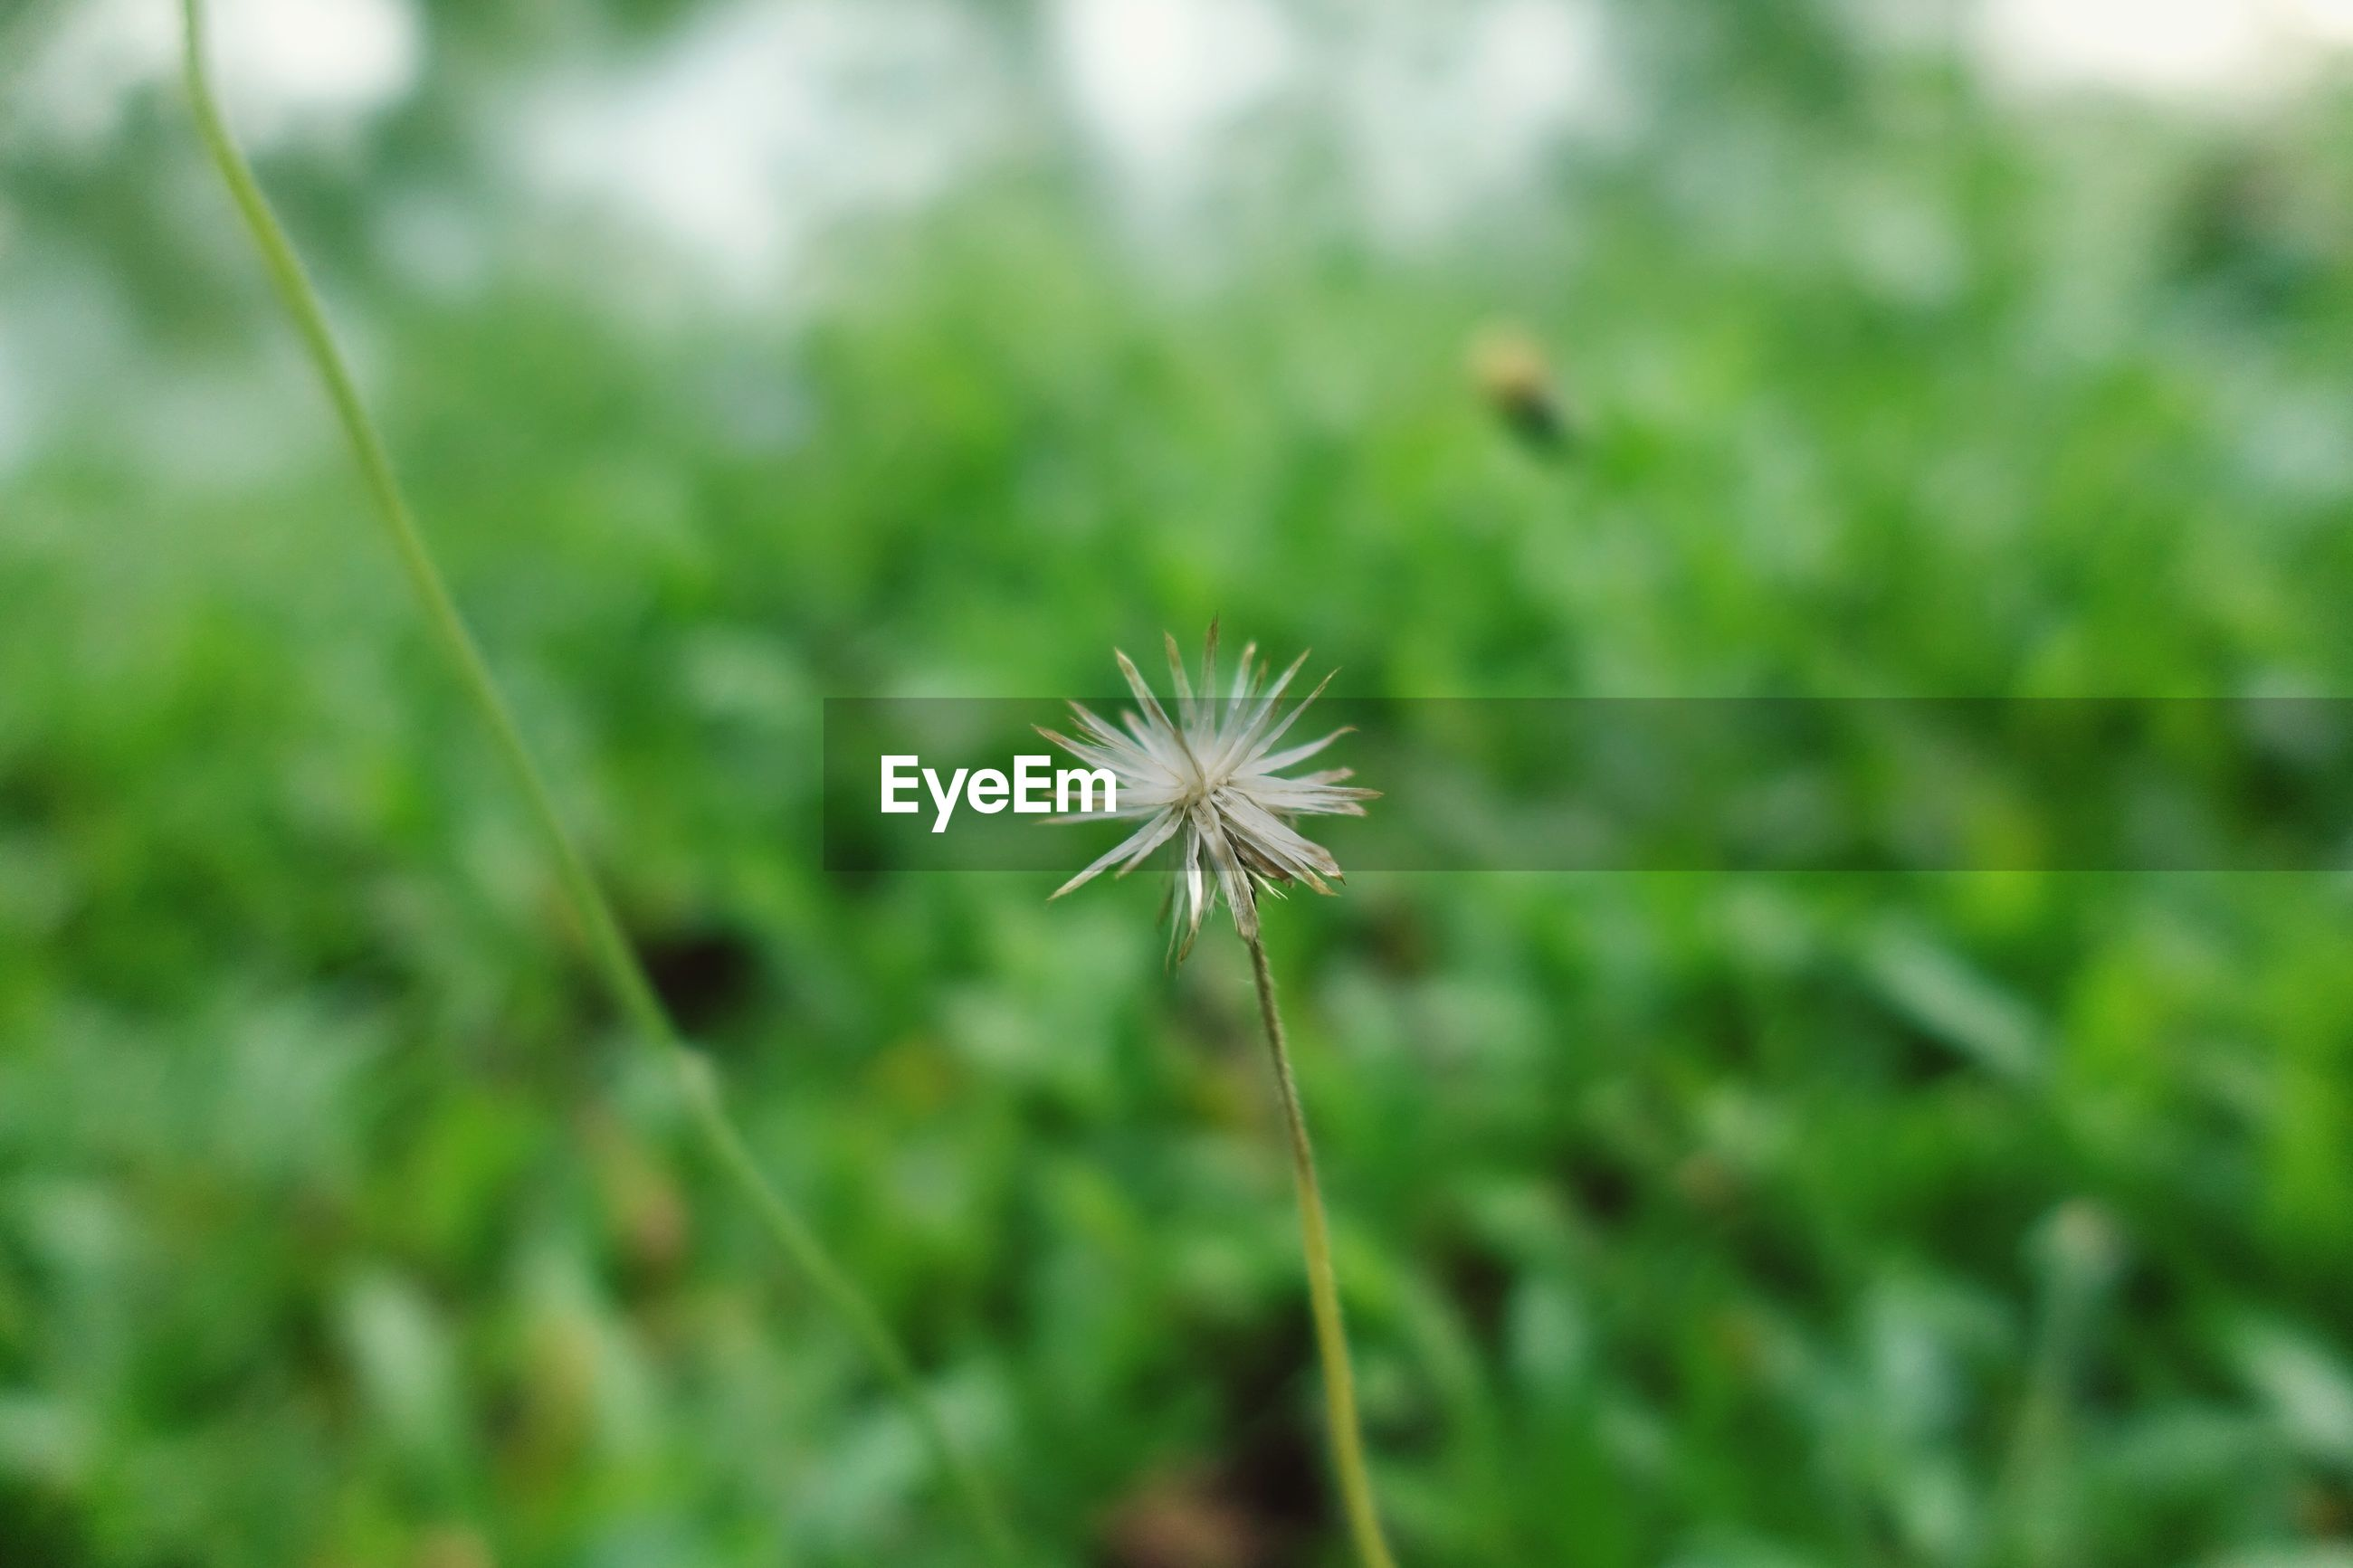 CLOSE-UP OF DANDELION FLOWER BUD ON FIELD